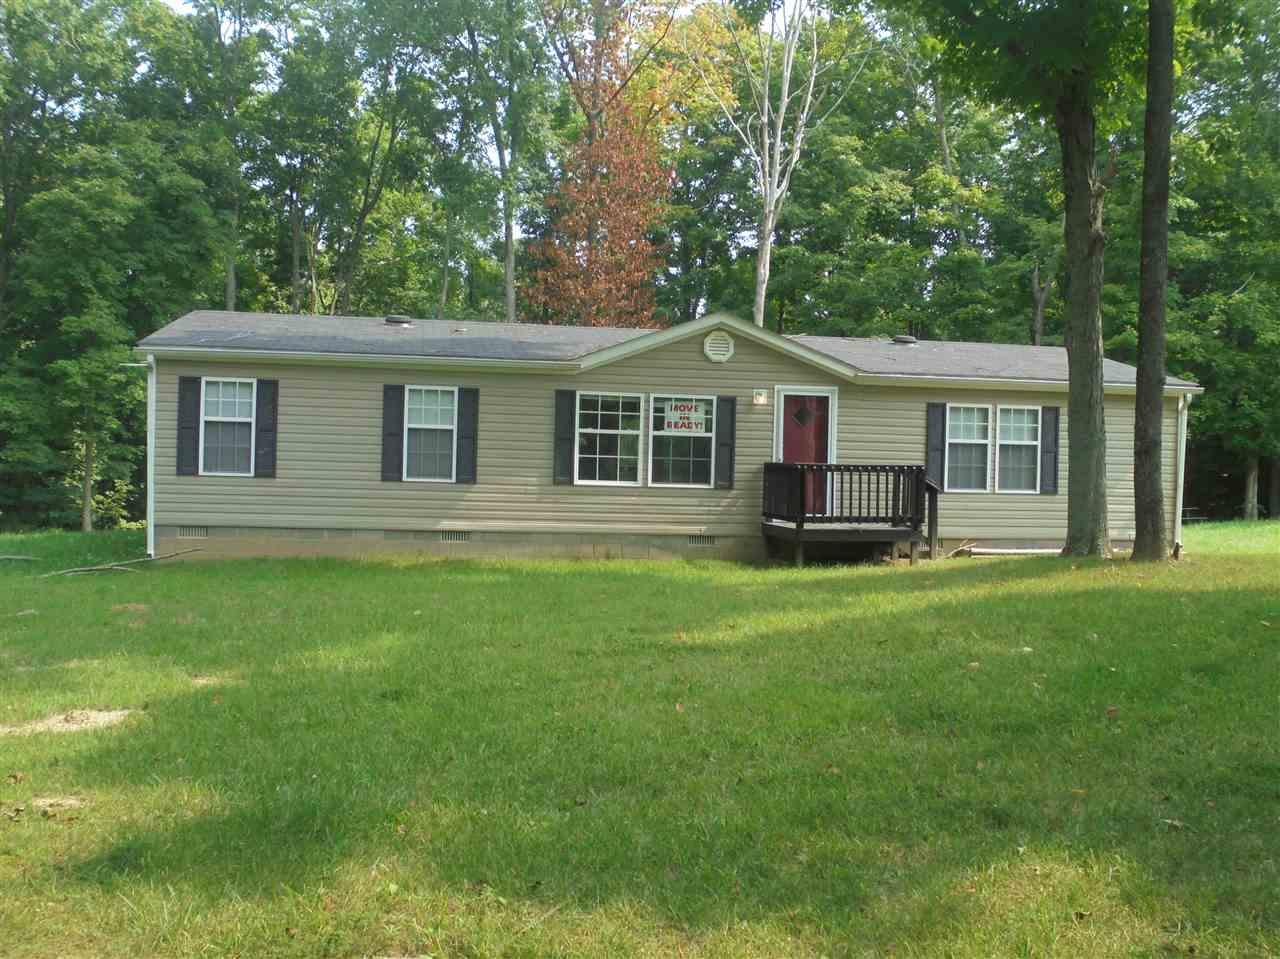 Real Estate for Sale, ListingId: 34906707, Loogootee,IN47553